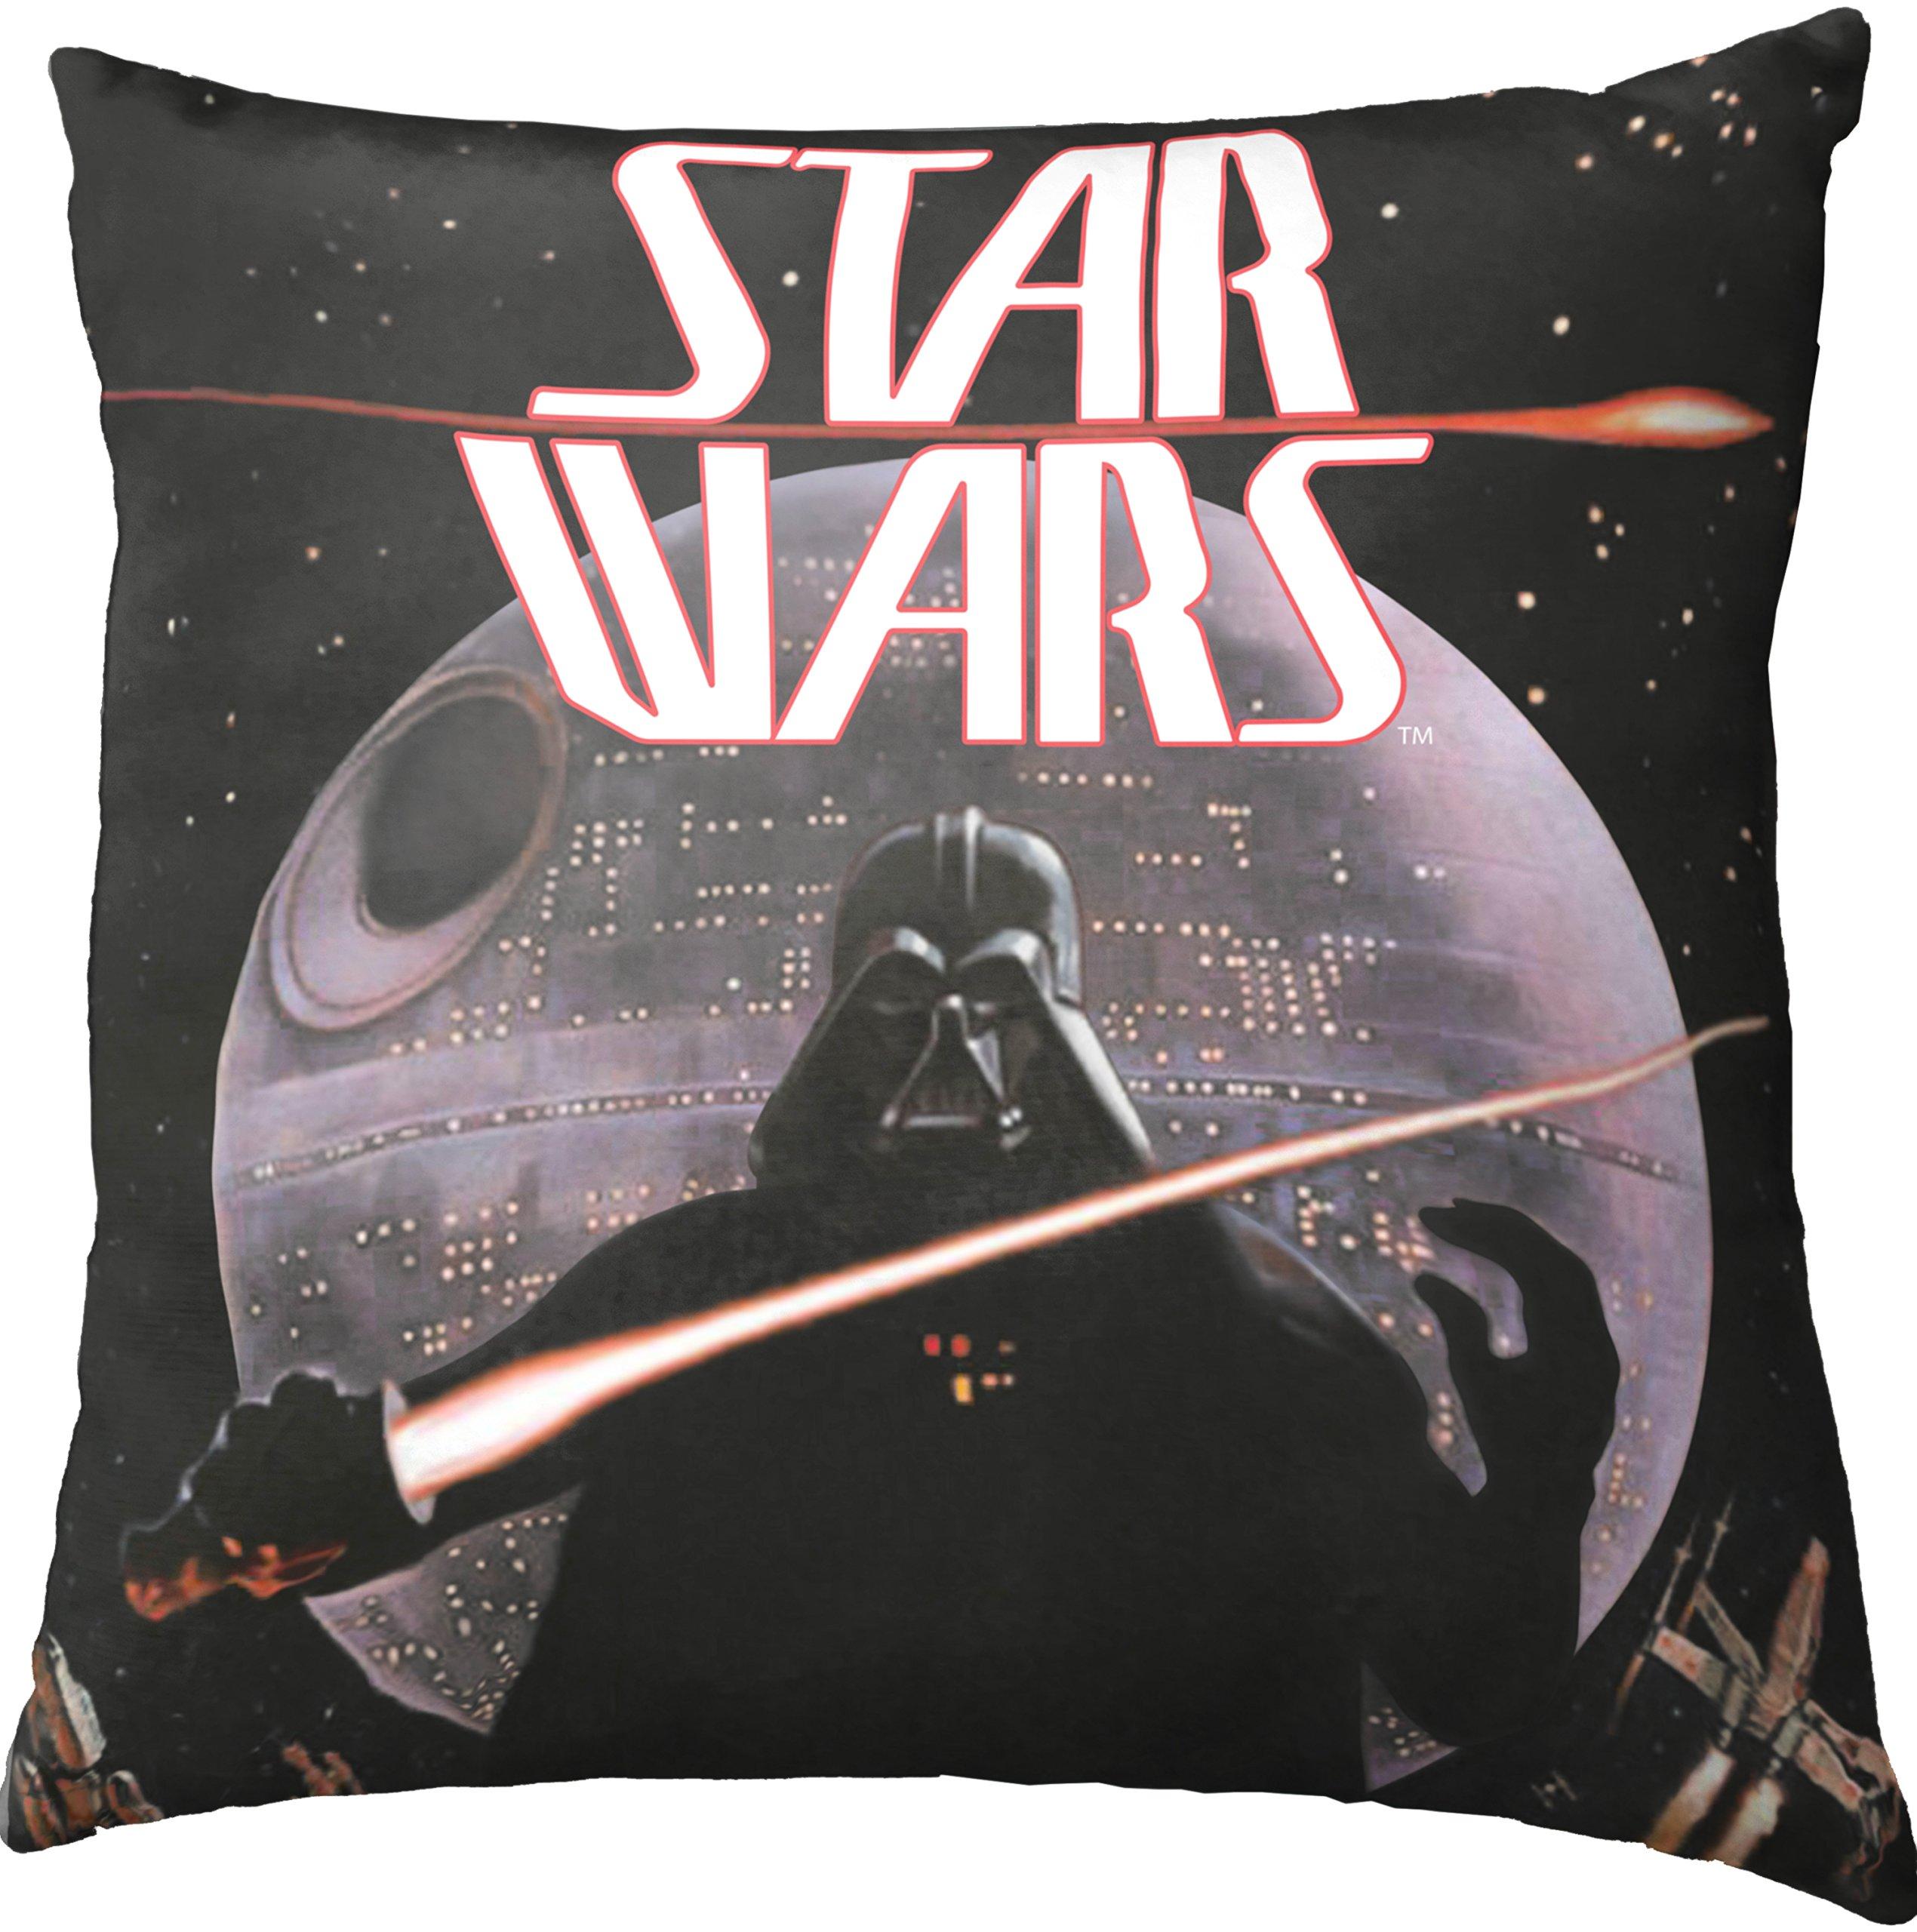 Star Wars Darth Vader Decorative Toss Throw Pillow, Black